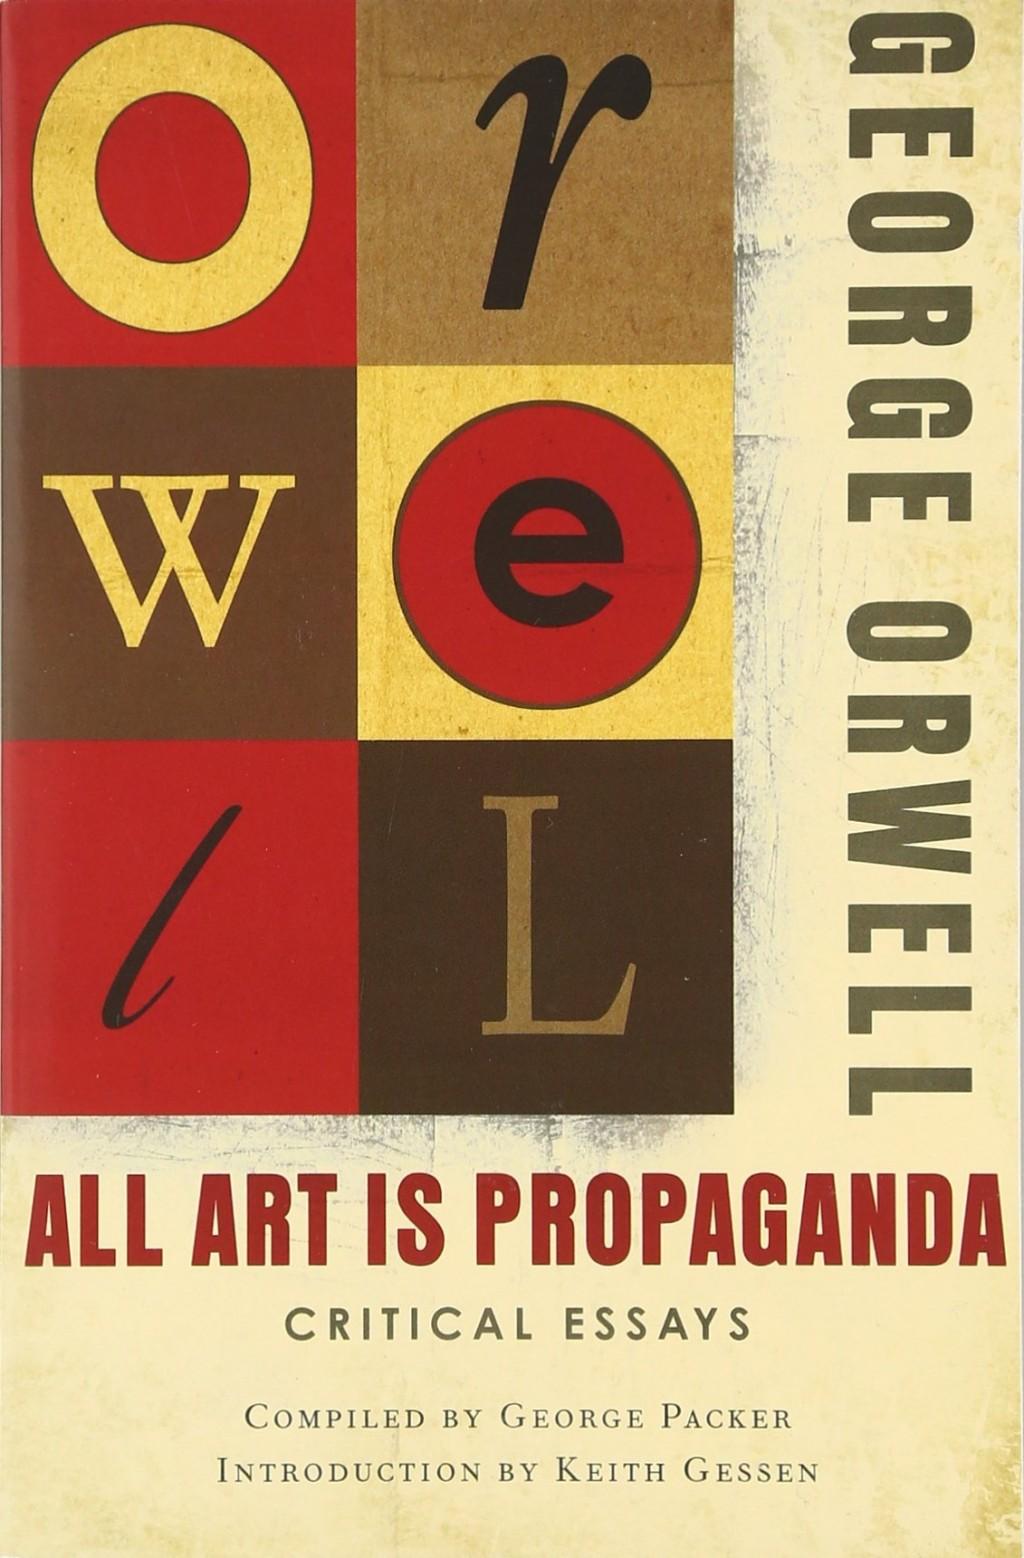 004 Essay Example 81lxm2g02fl George Orwell Frightening Essays Everyman's Library Summary Bookshop Memories Large